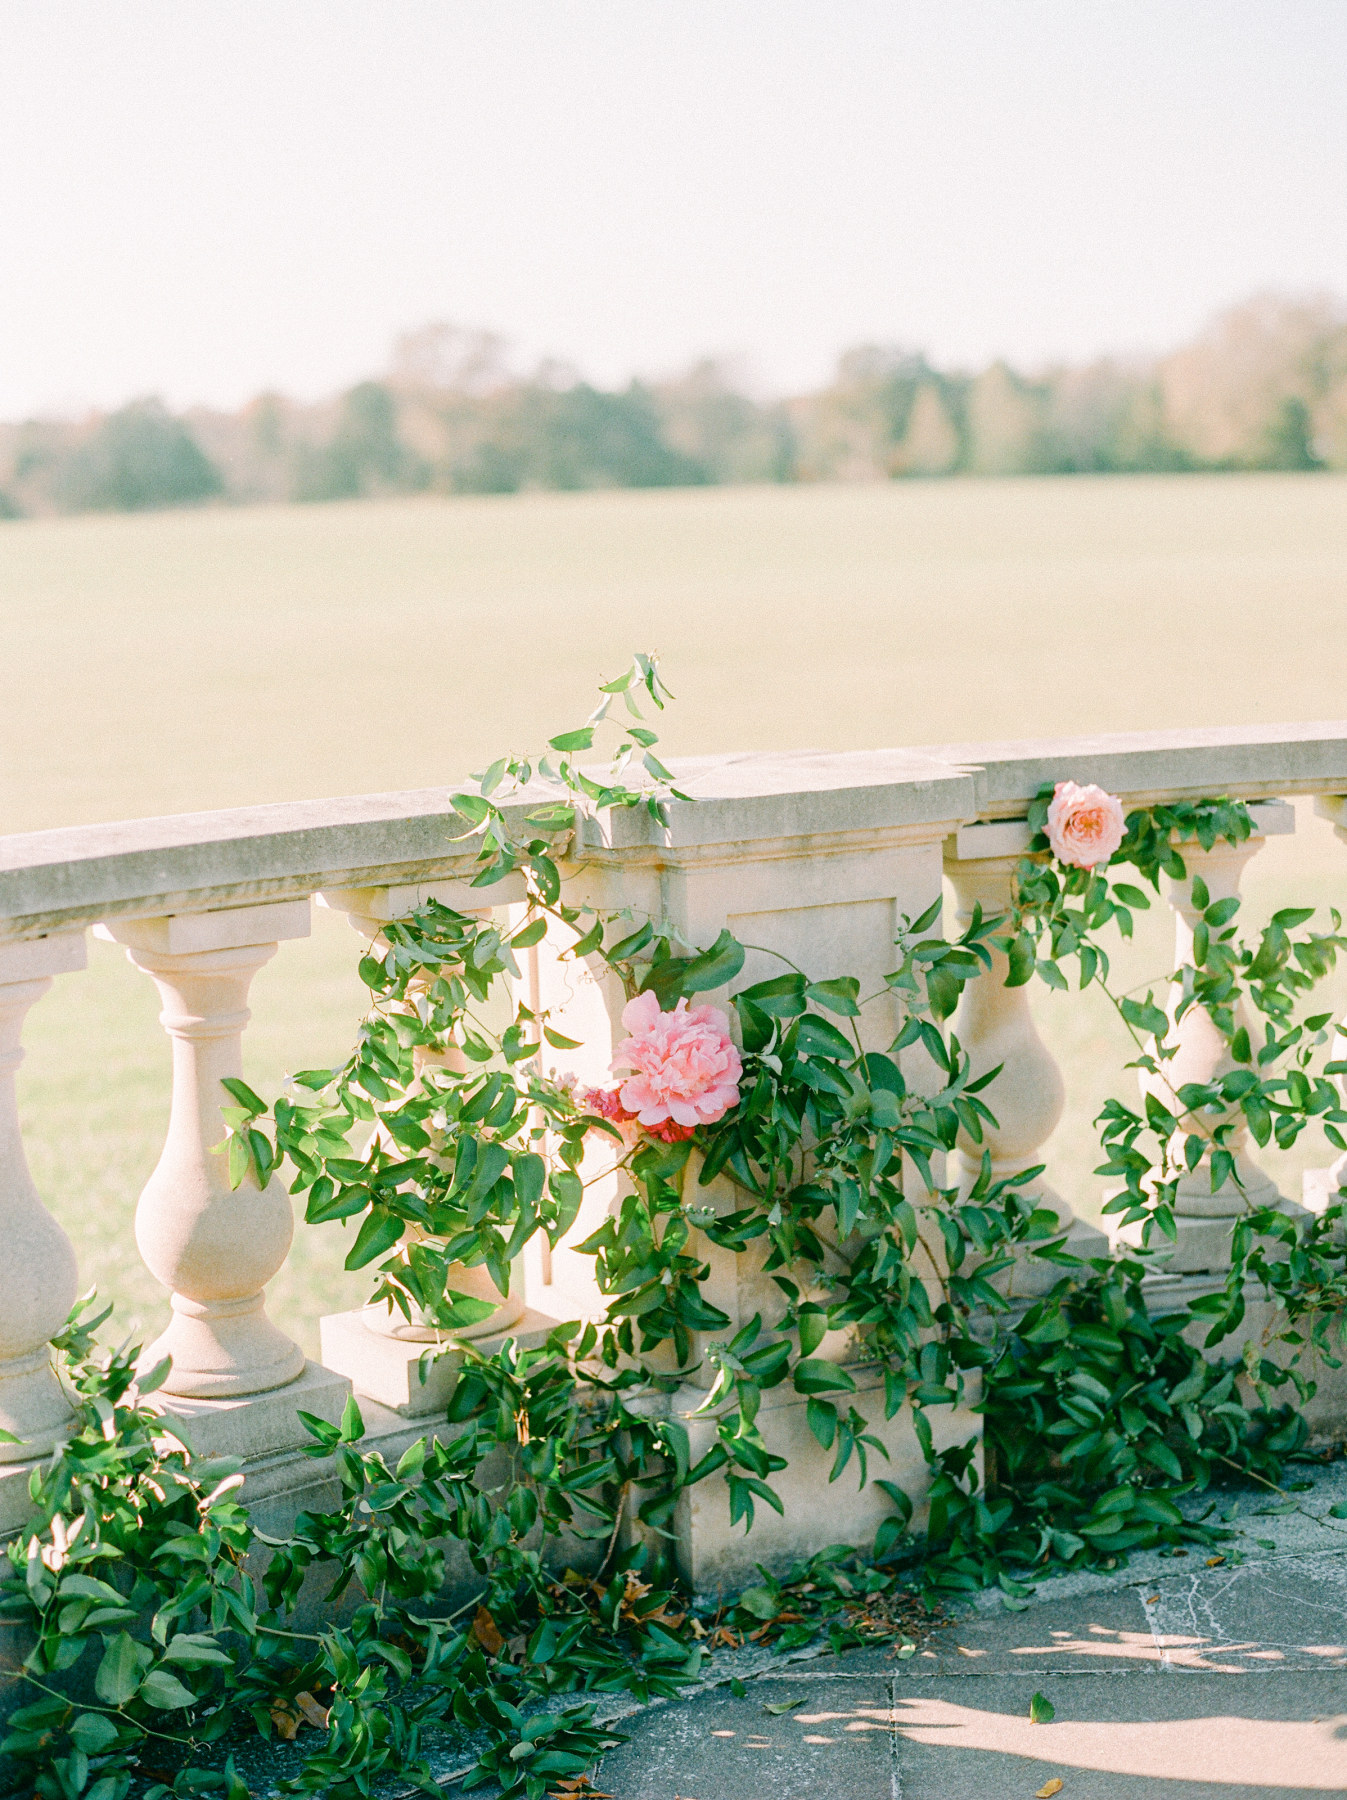 31Great_Marsh_Estates_Wedding_Anne_Kelley_Events_Astrid_Photography146486070012-2